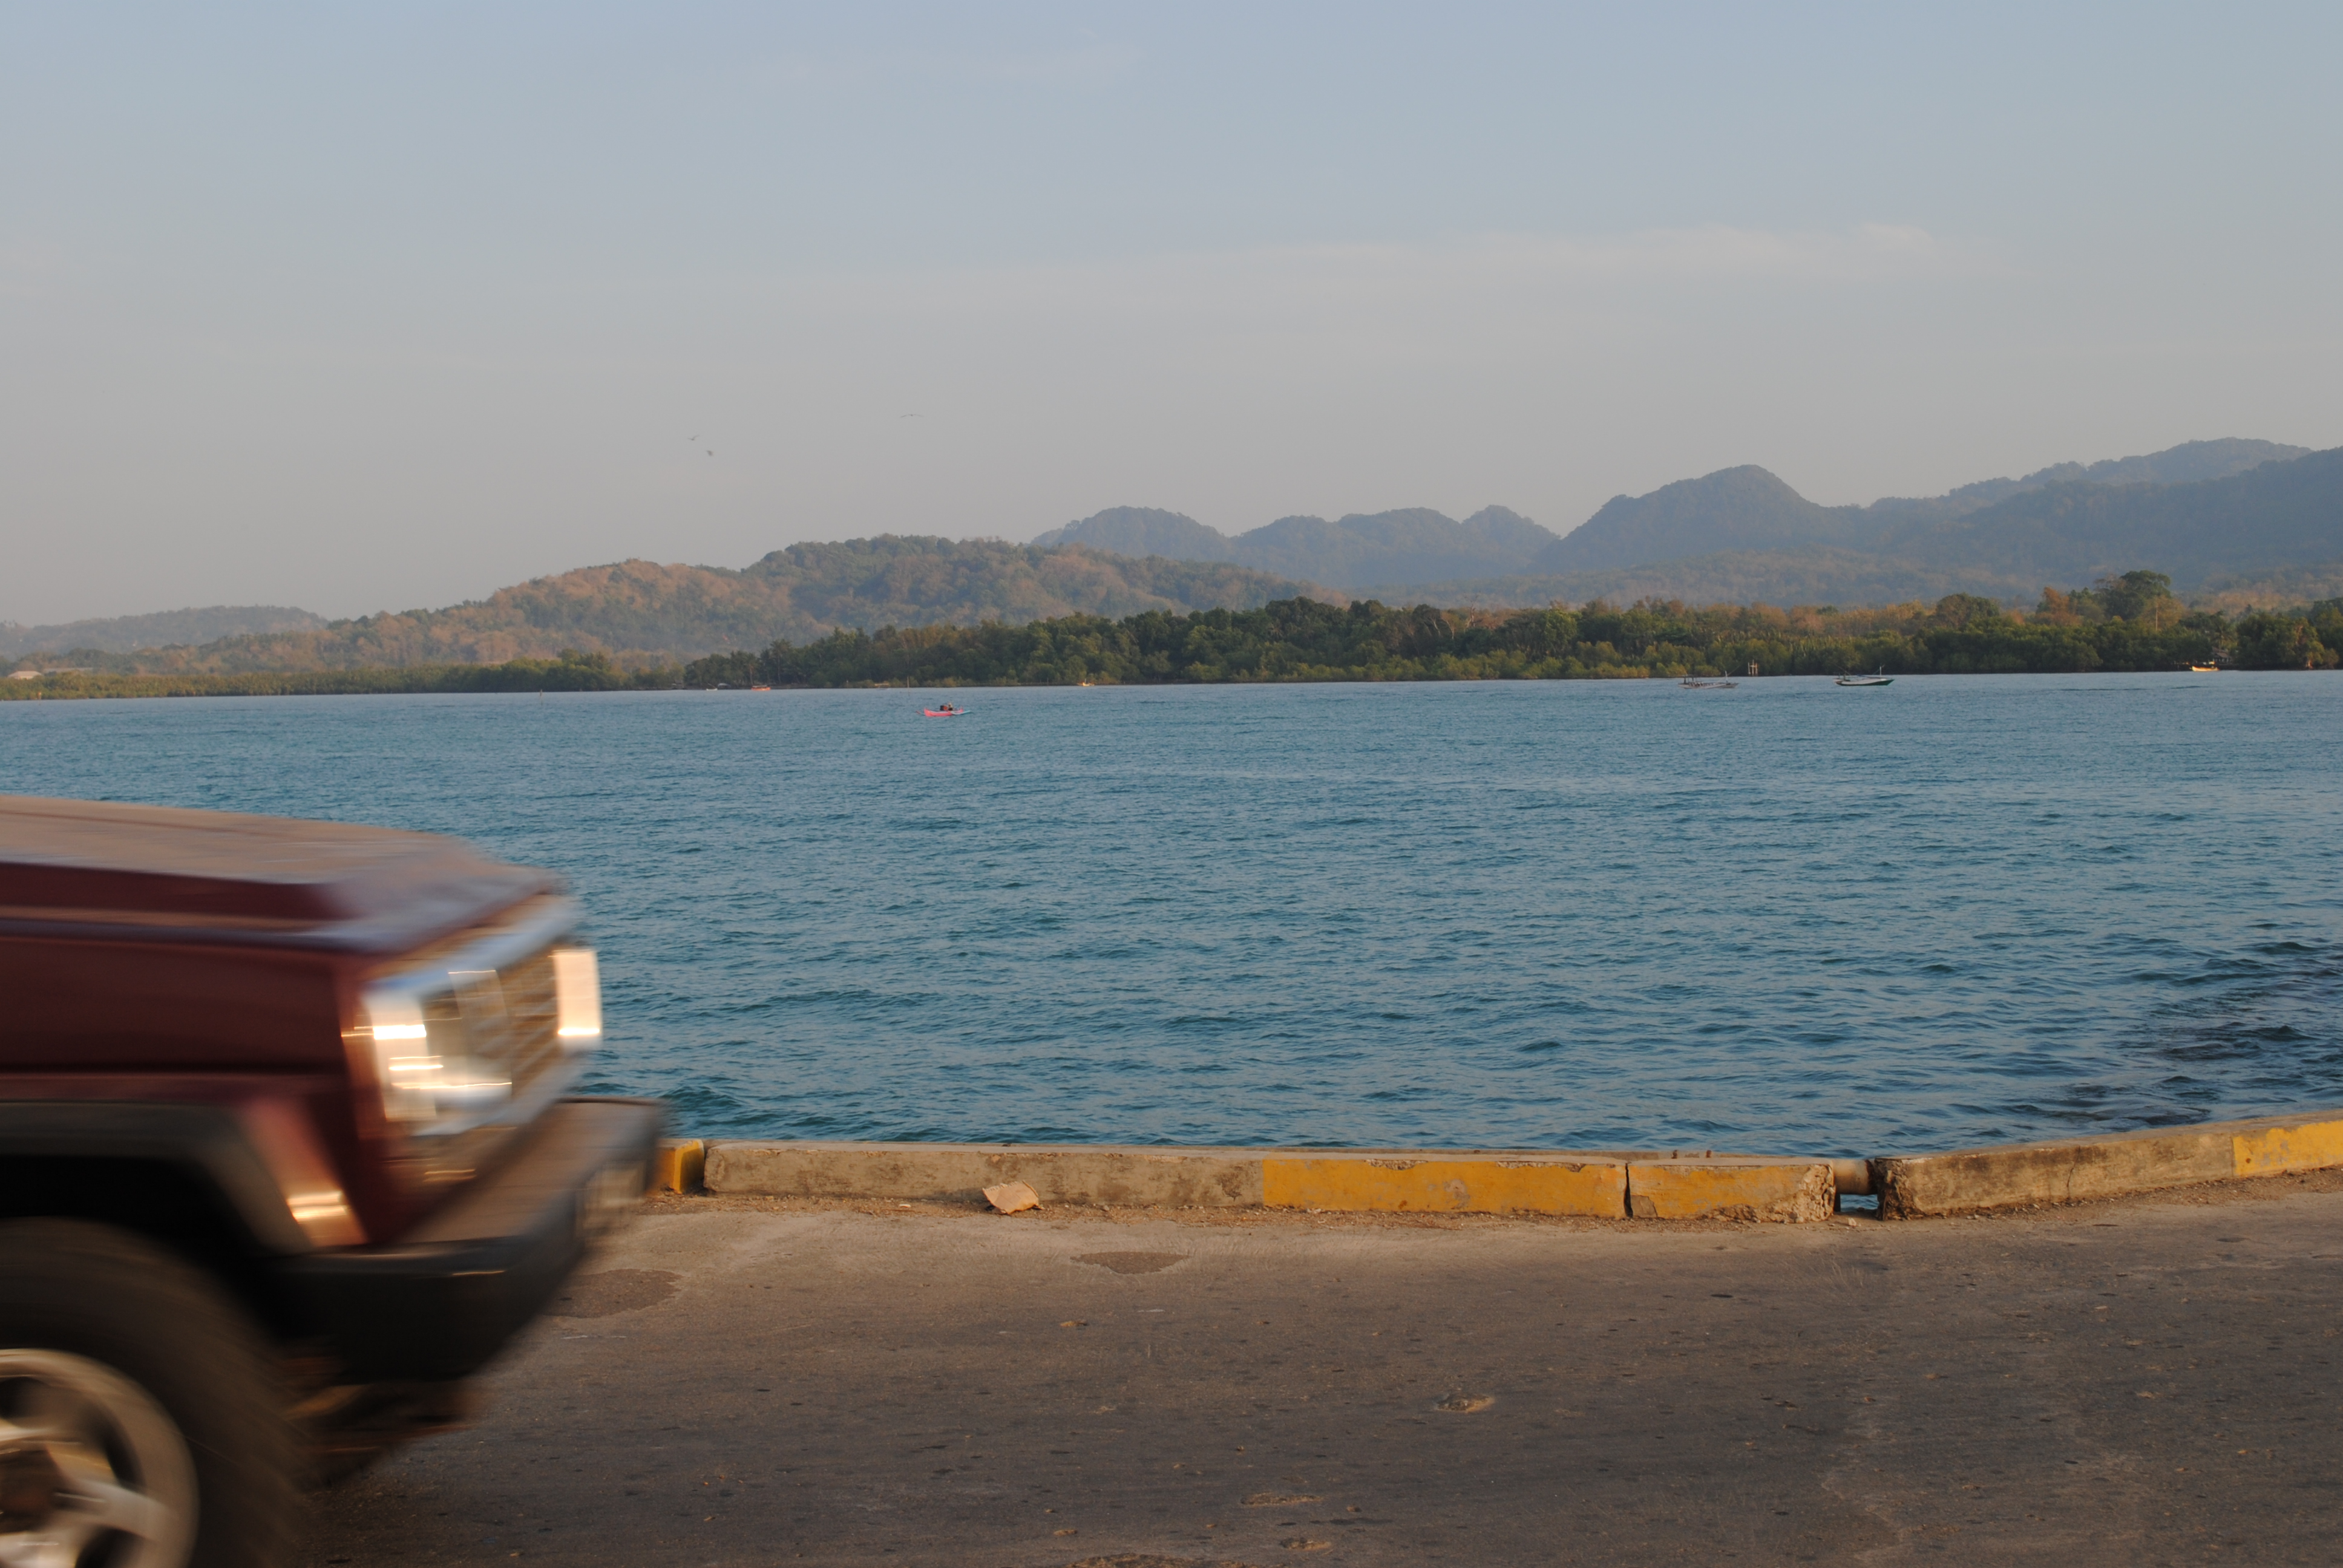 Pulau Bawean Menjadi Destinasi Maritim Dunia Saudagar Jakarta Antara News